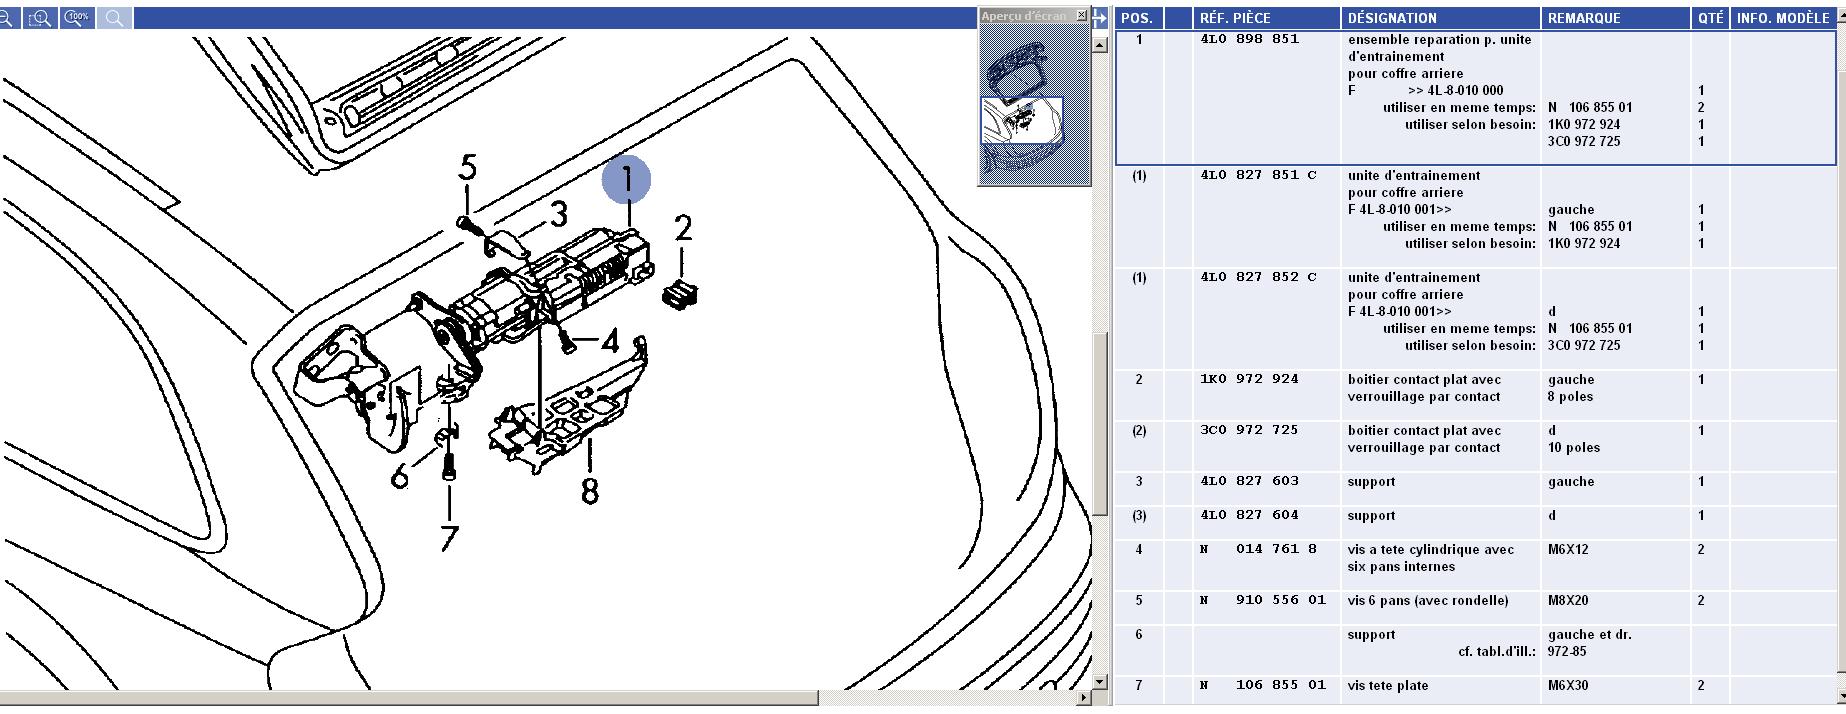 reference-moteur-hayon-audi-q7-etka.png